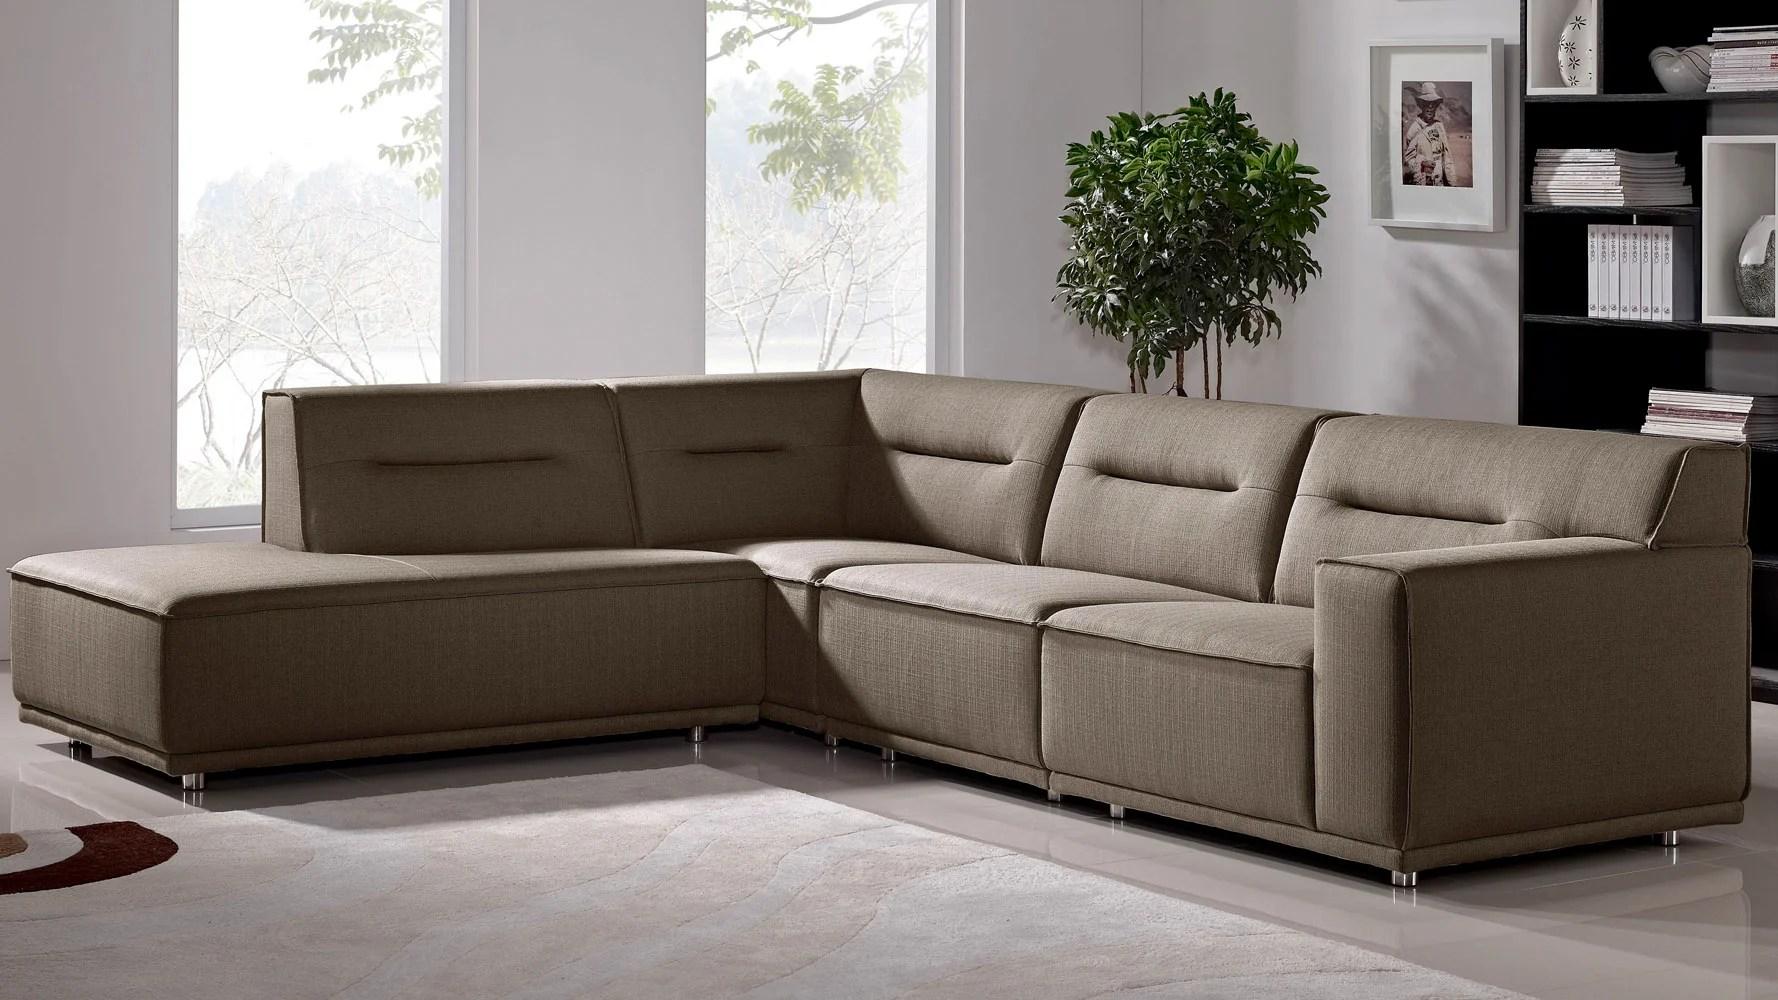 modern fabric sofa set leather uk made sectional yorba